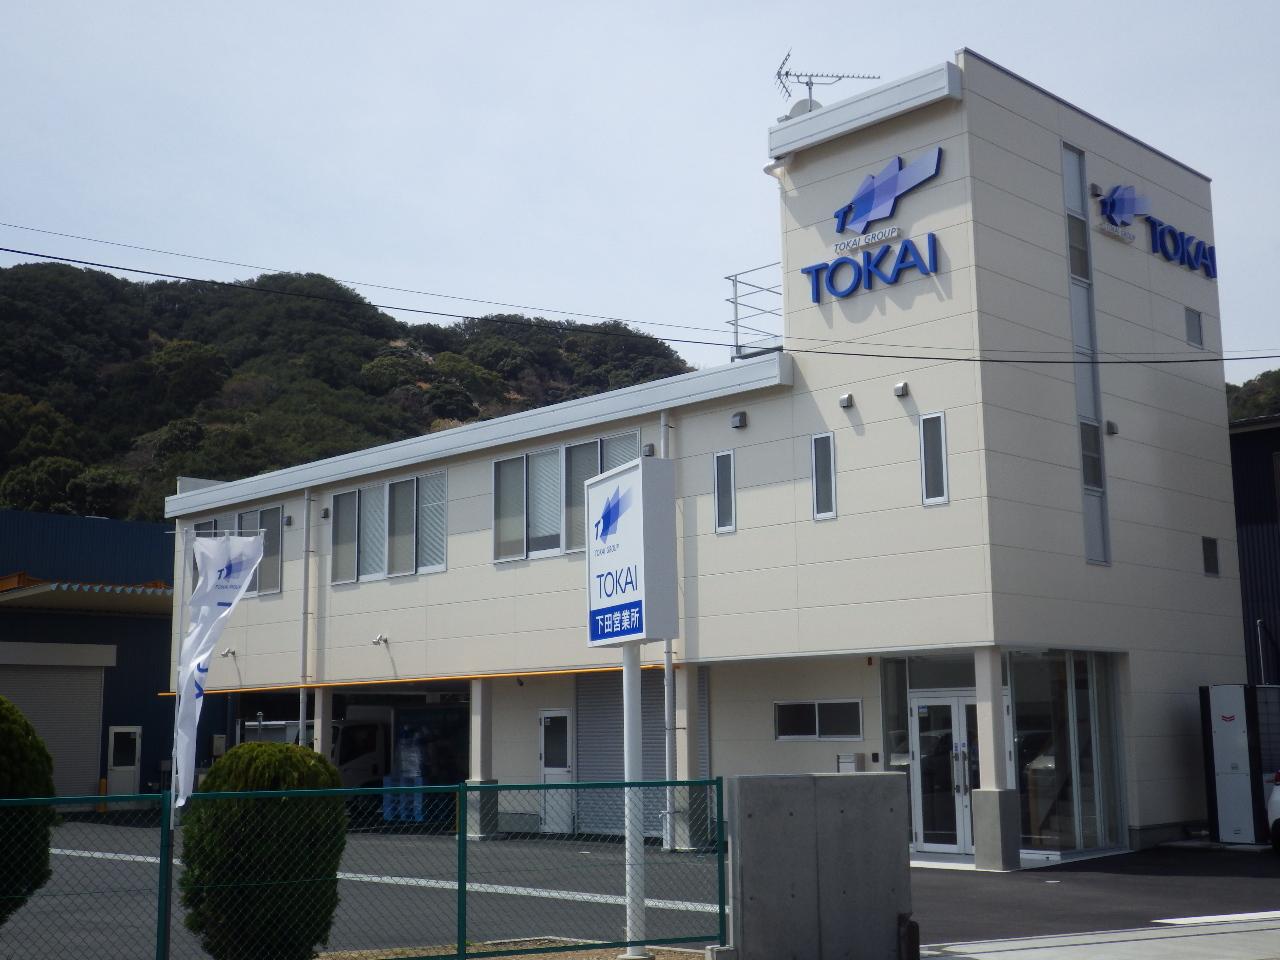 ㈱TOKAI下田営業所事務所建替工事